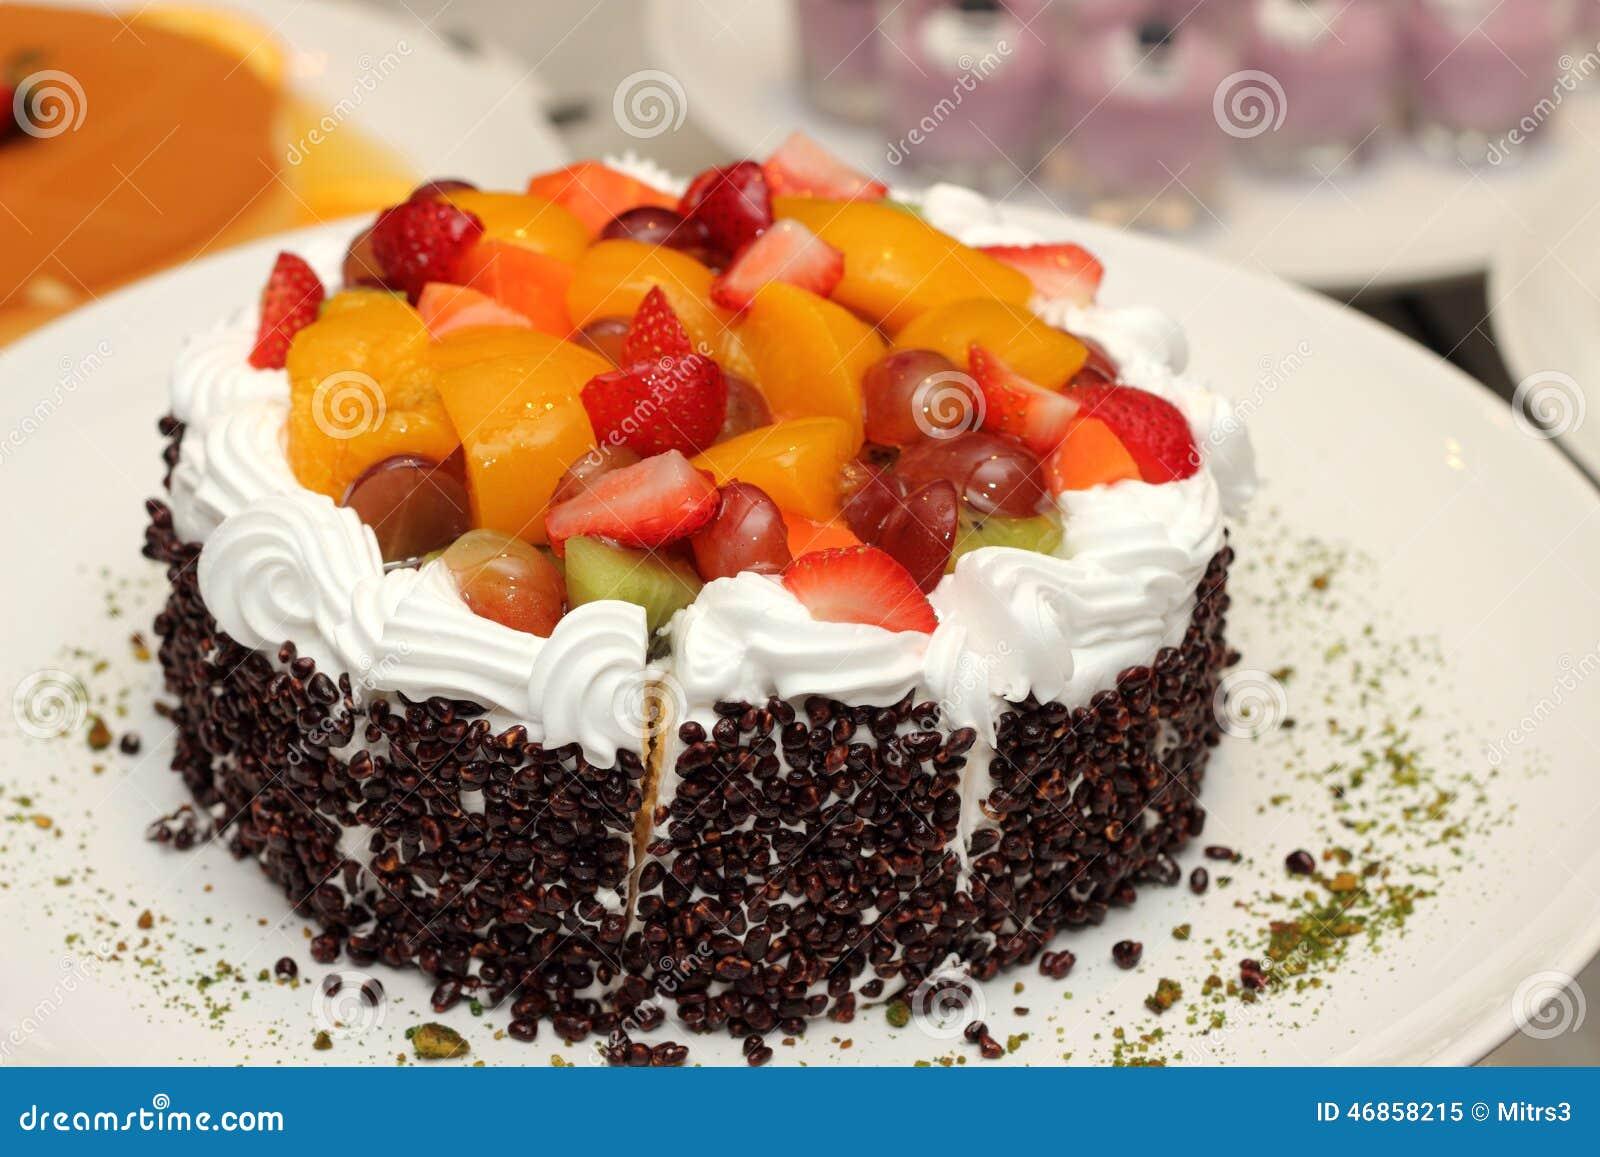 Fruit Flan Cake Decoration : Fresh Fruit Flan Cake With Cream Stock Photo - Image: 46858215